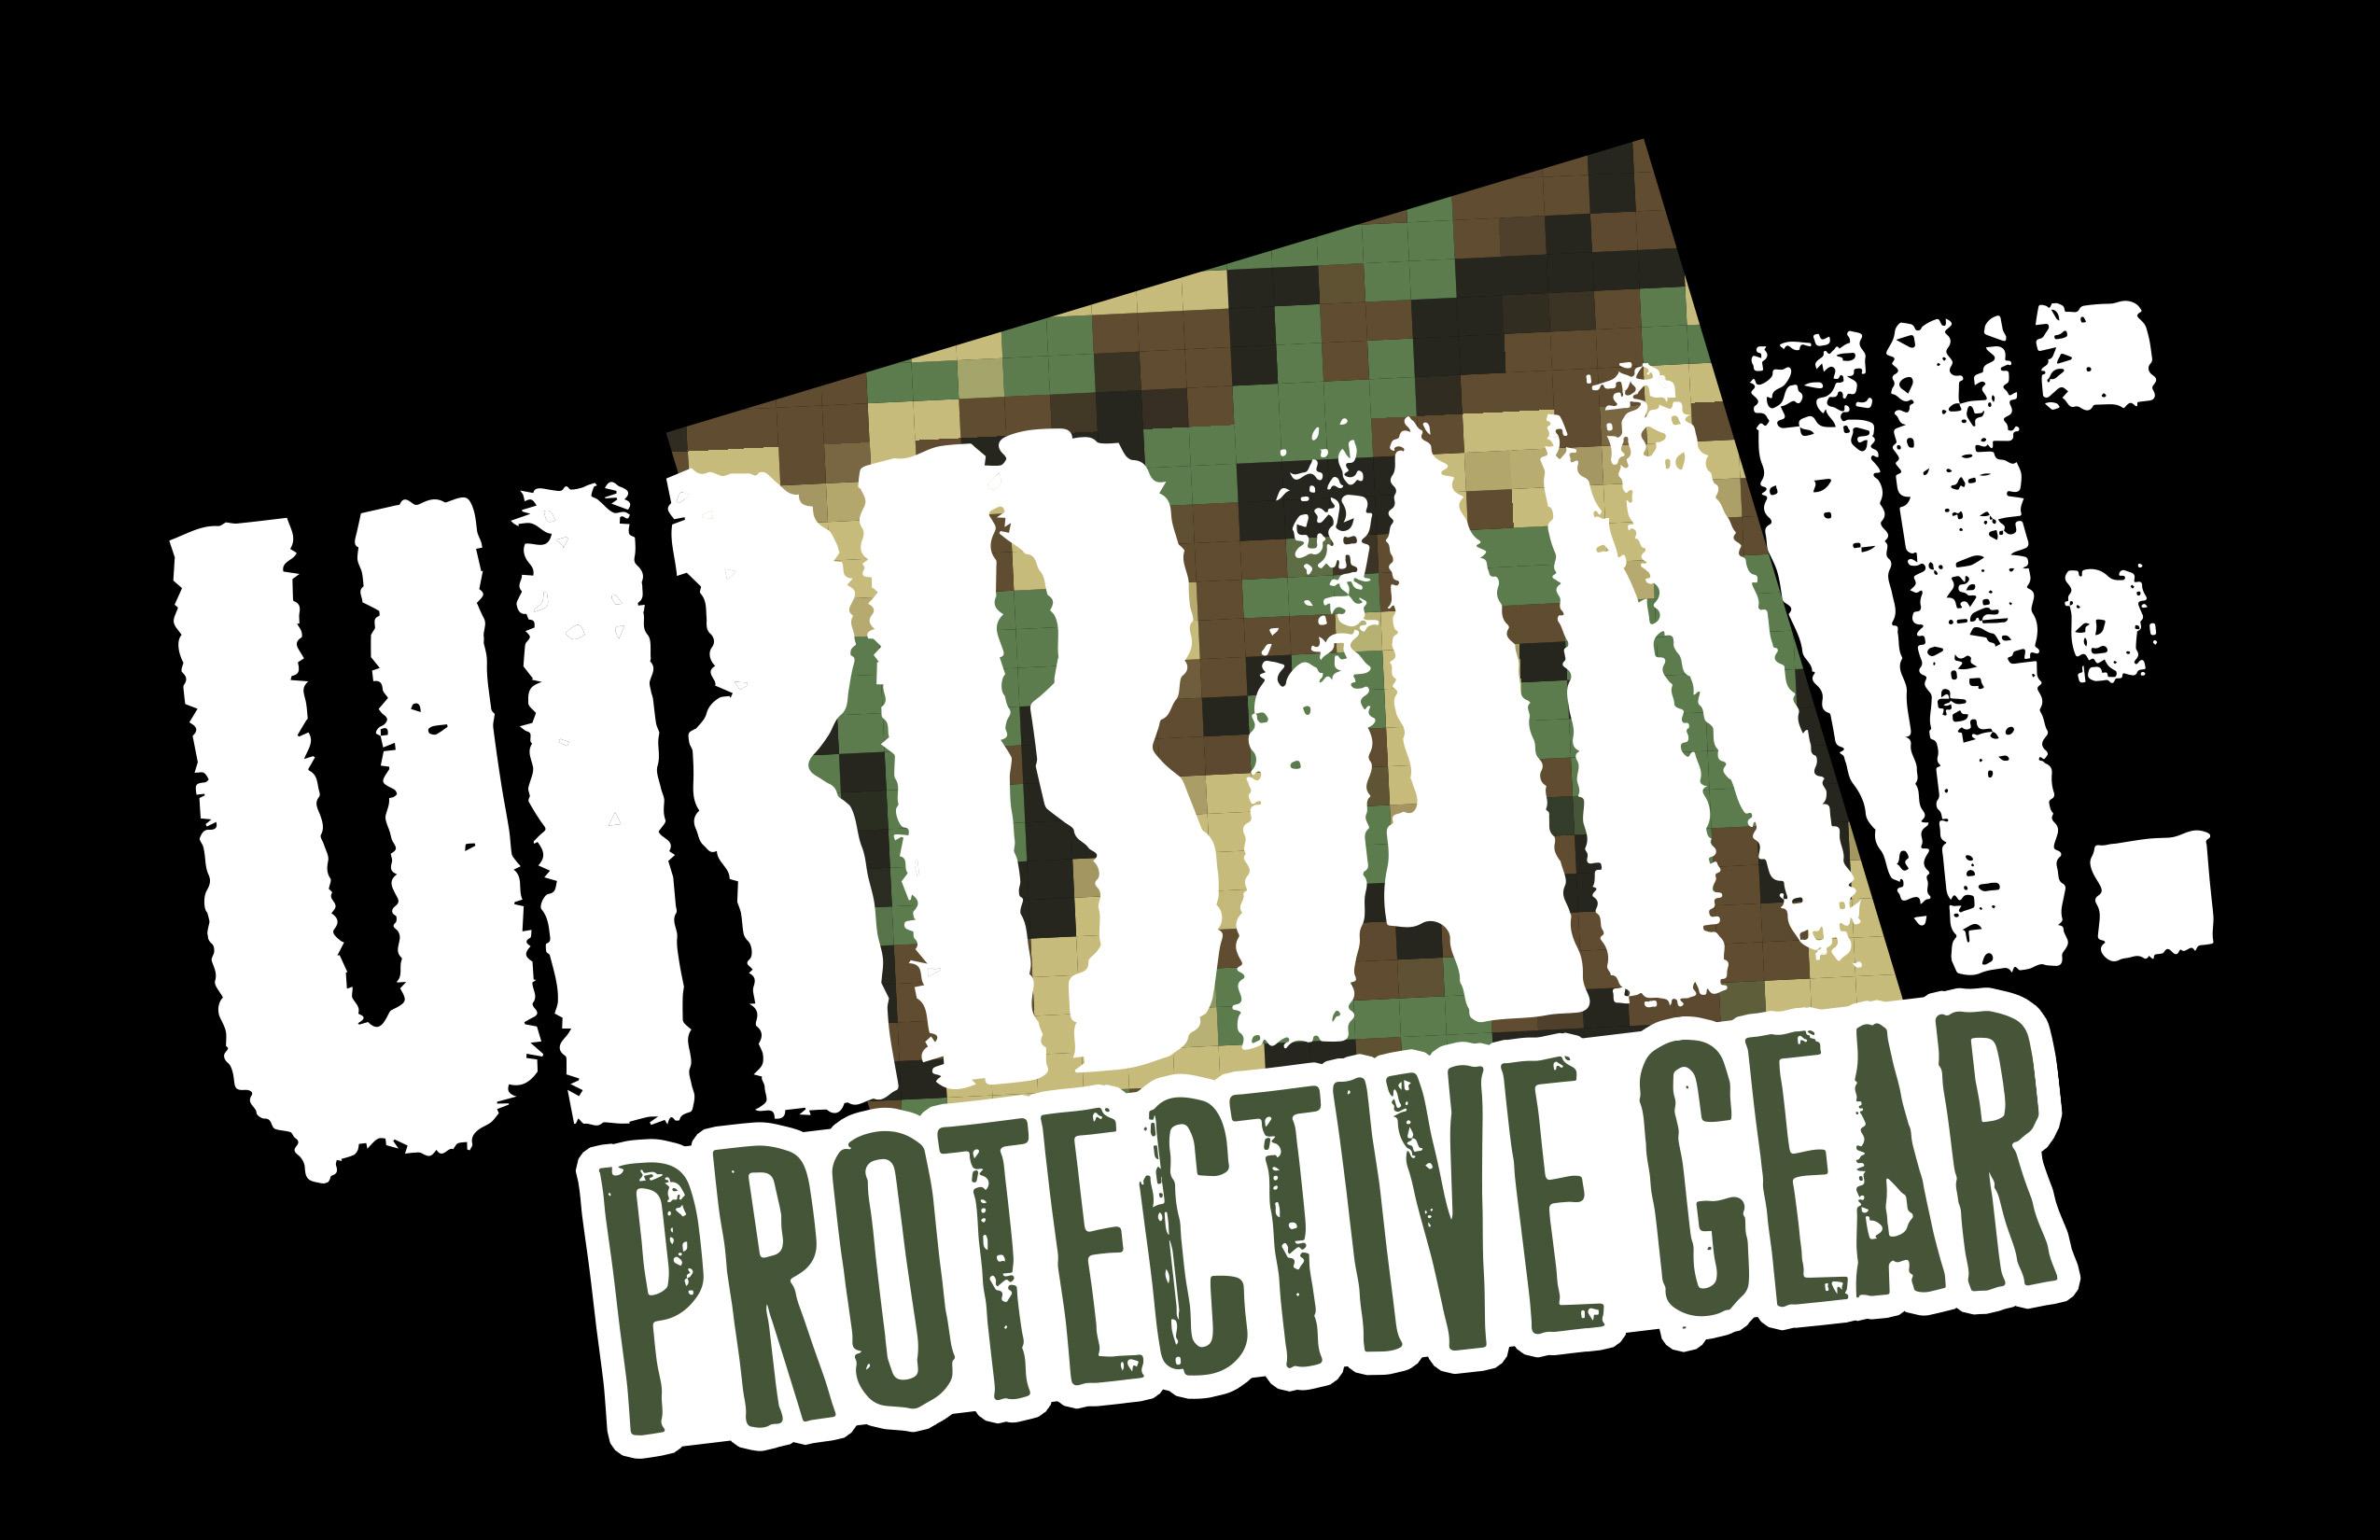 Urbane Protective Gear